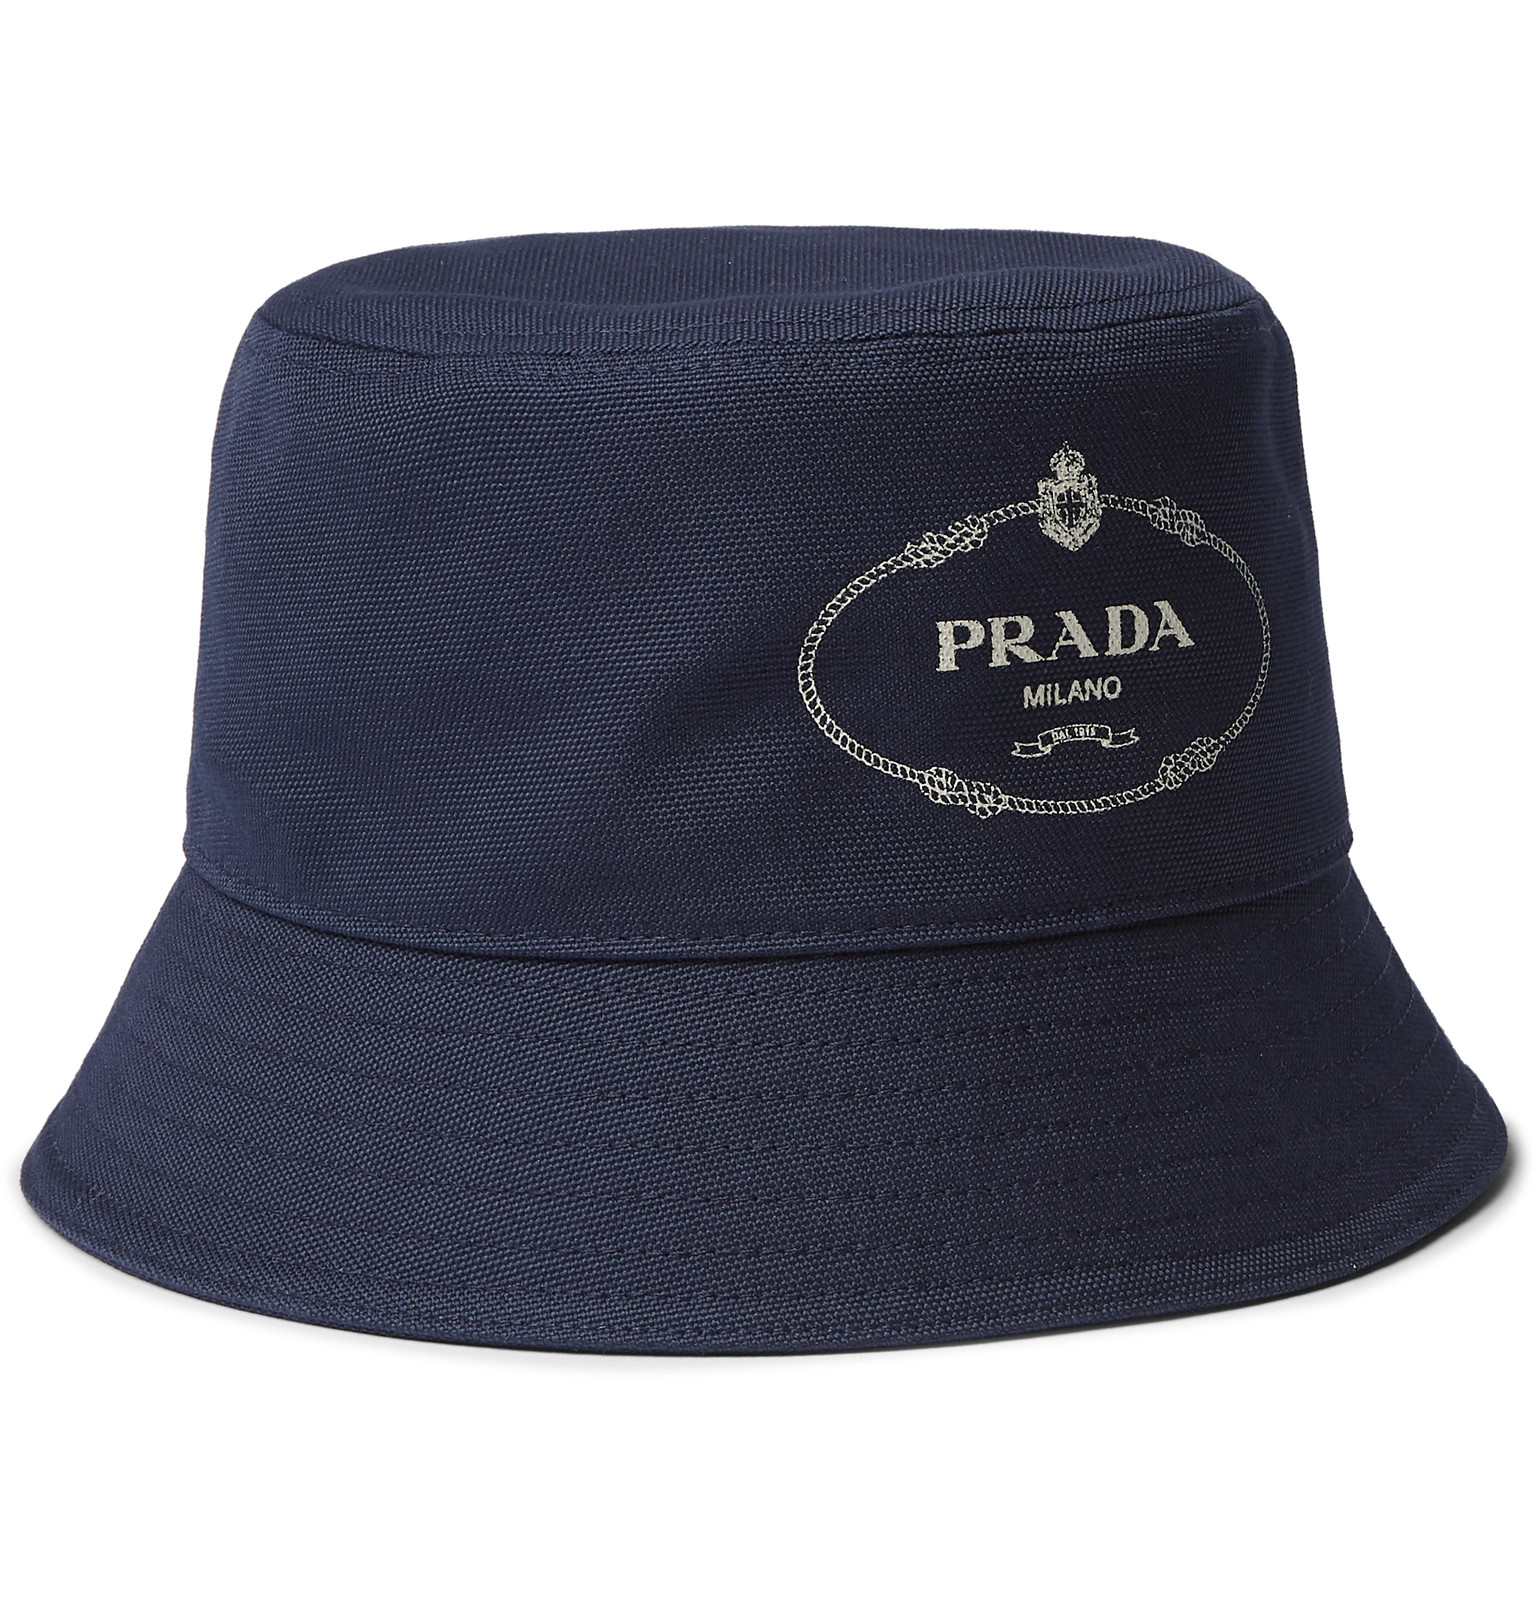 8d15246ea9efa Prada - Logo-Print Cotton-Canvas Bucket Hat